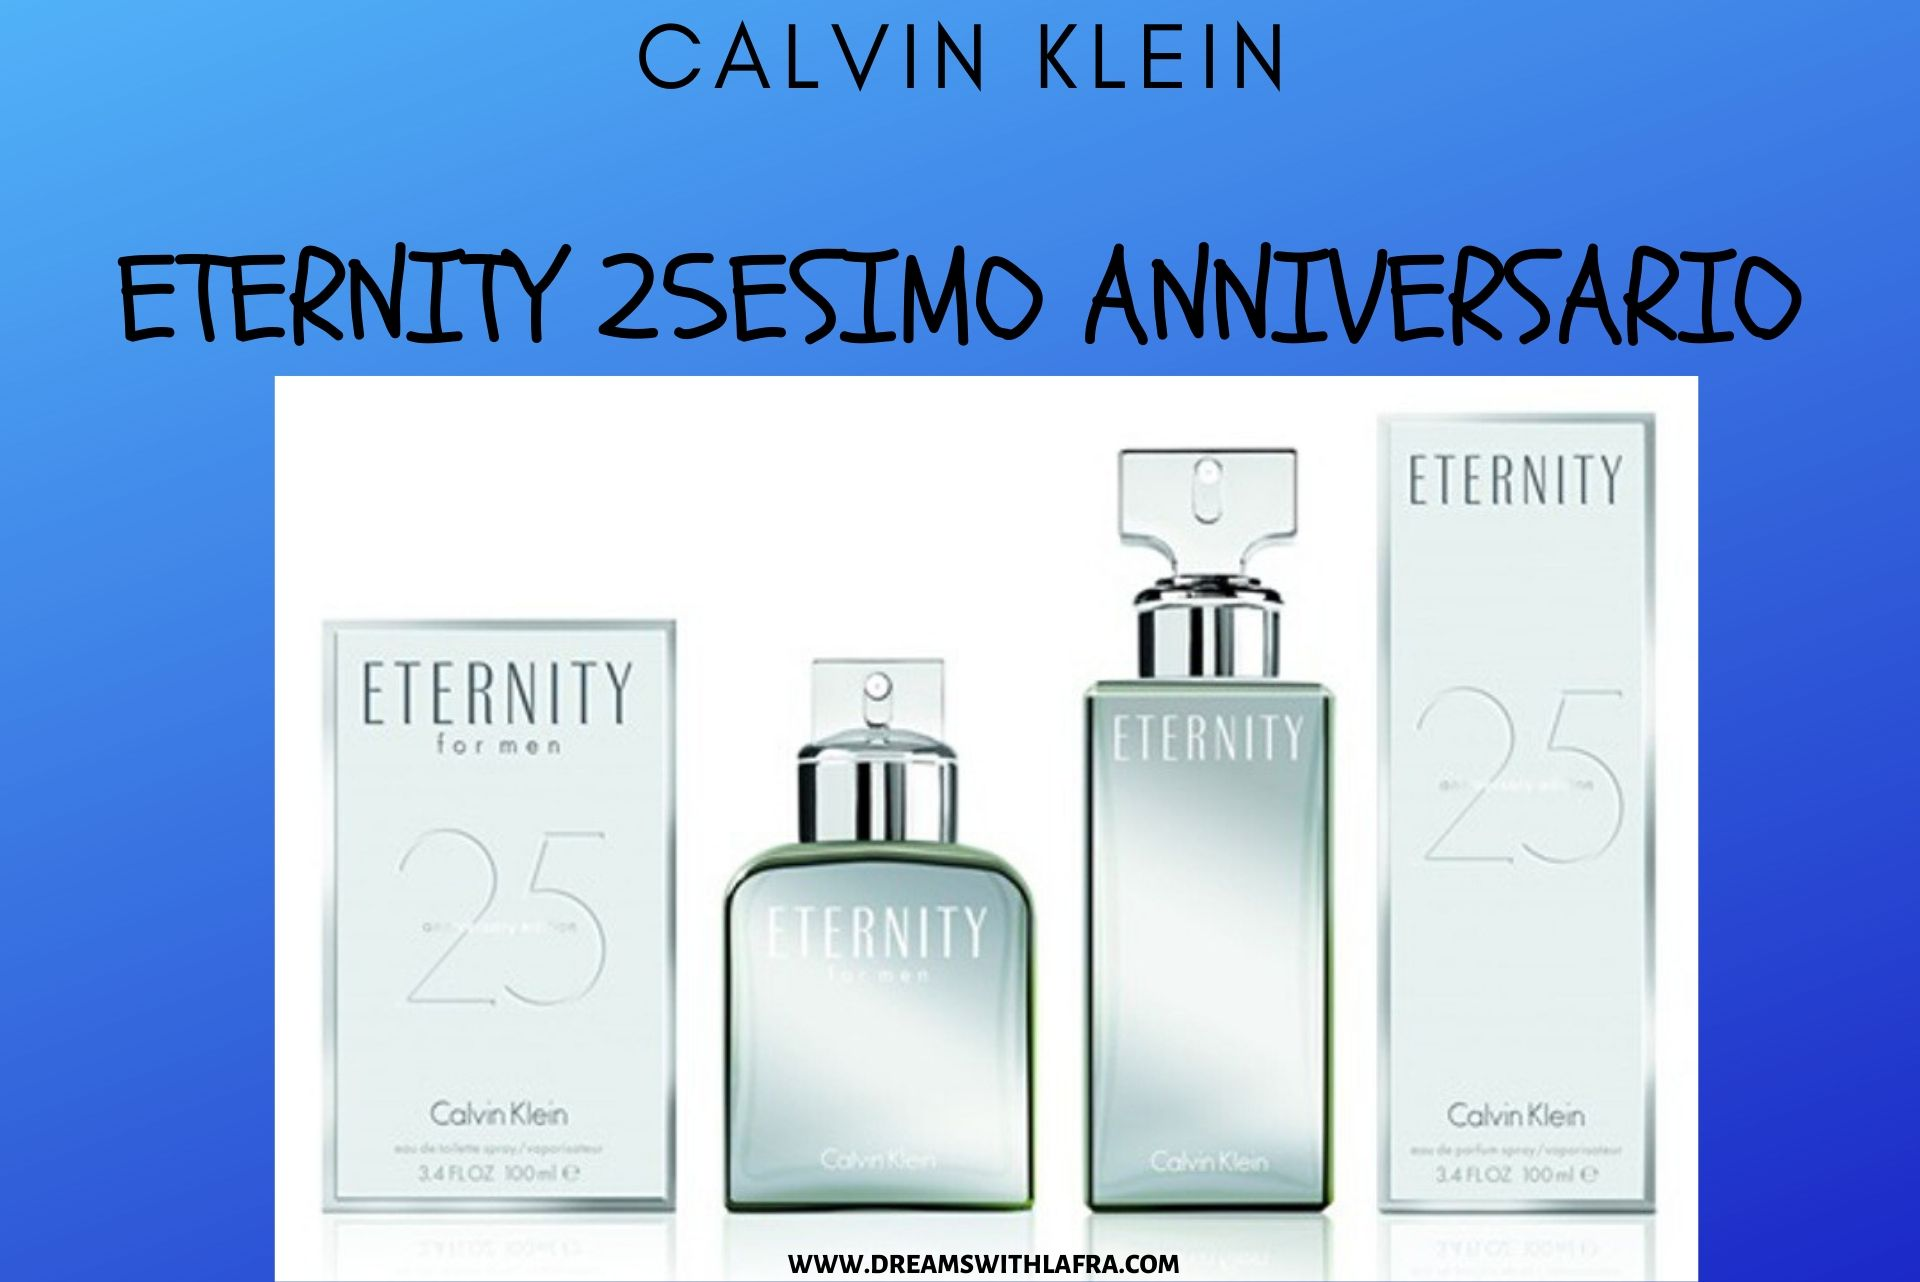 Calvin Klein Eternity 25esimo anniversario